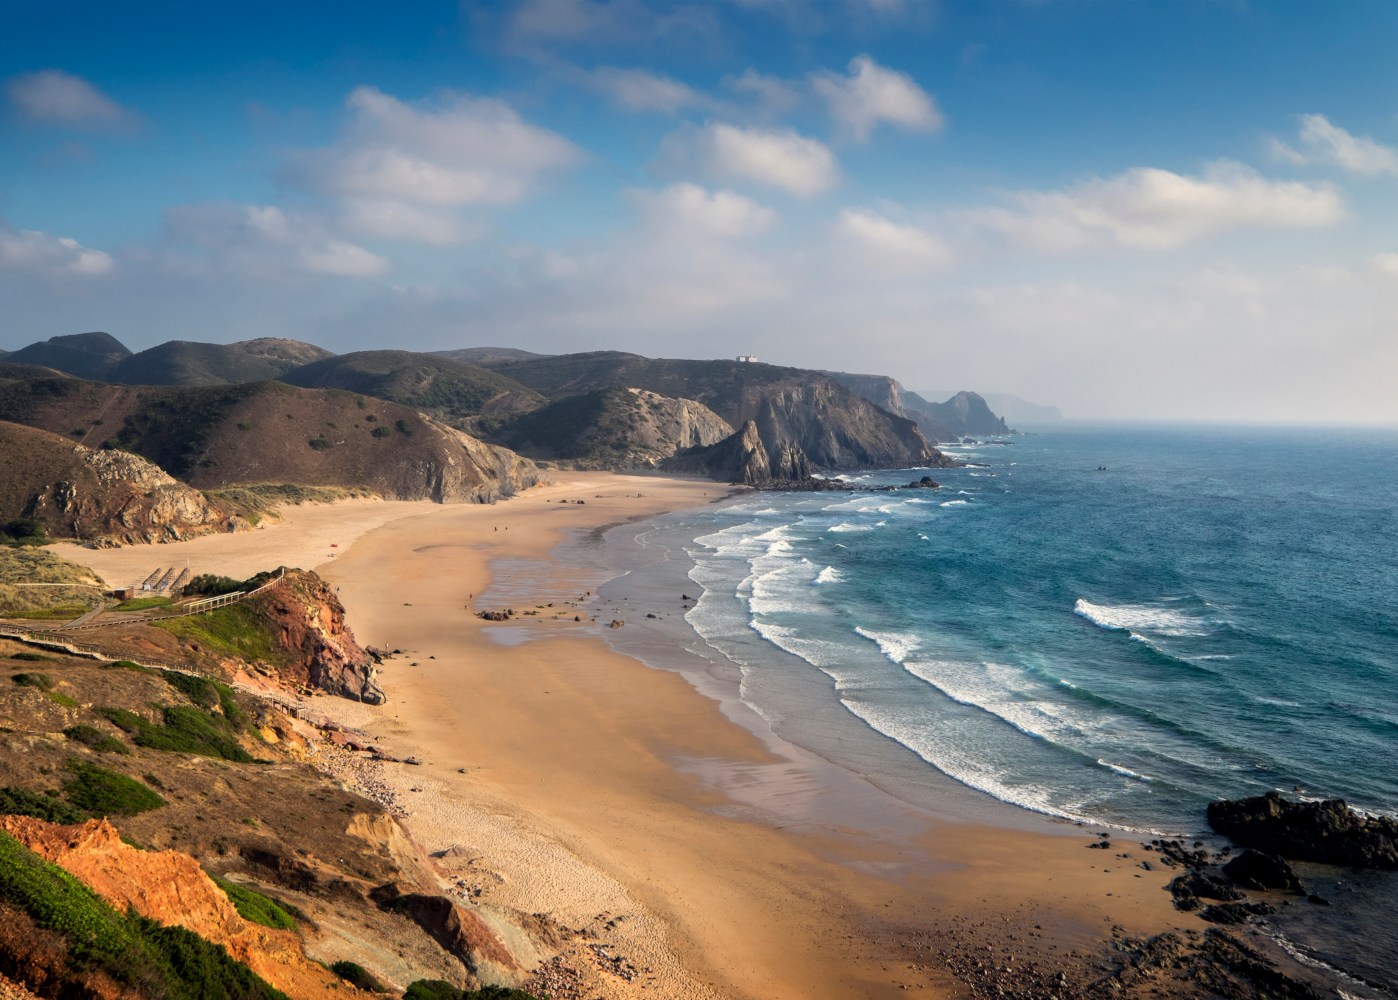 vista sobre praia deserta